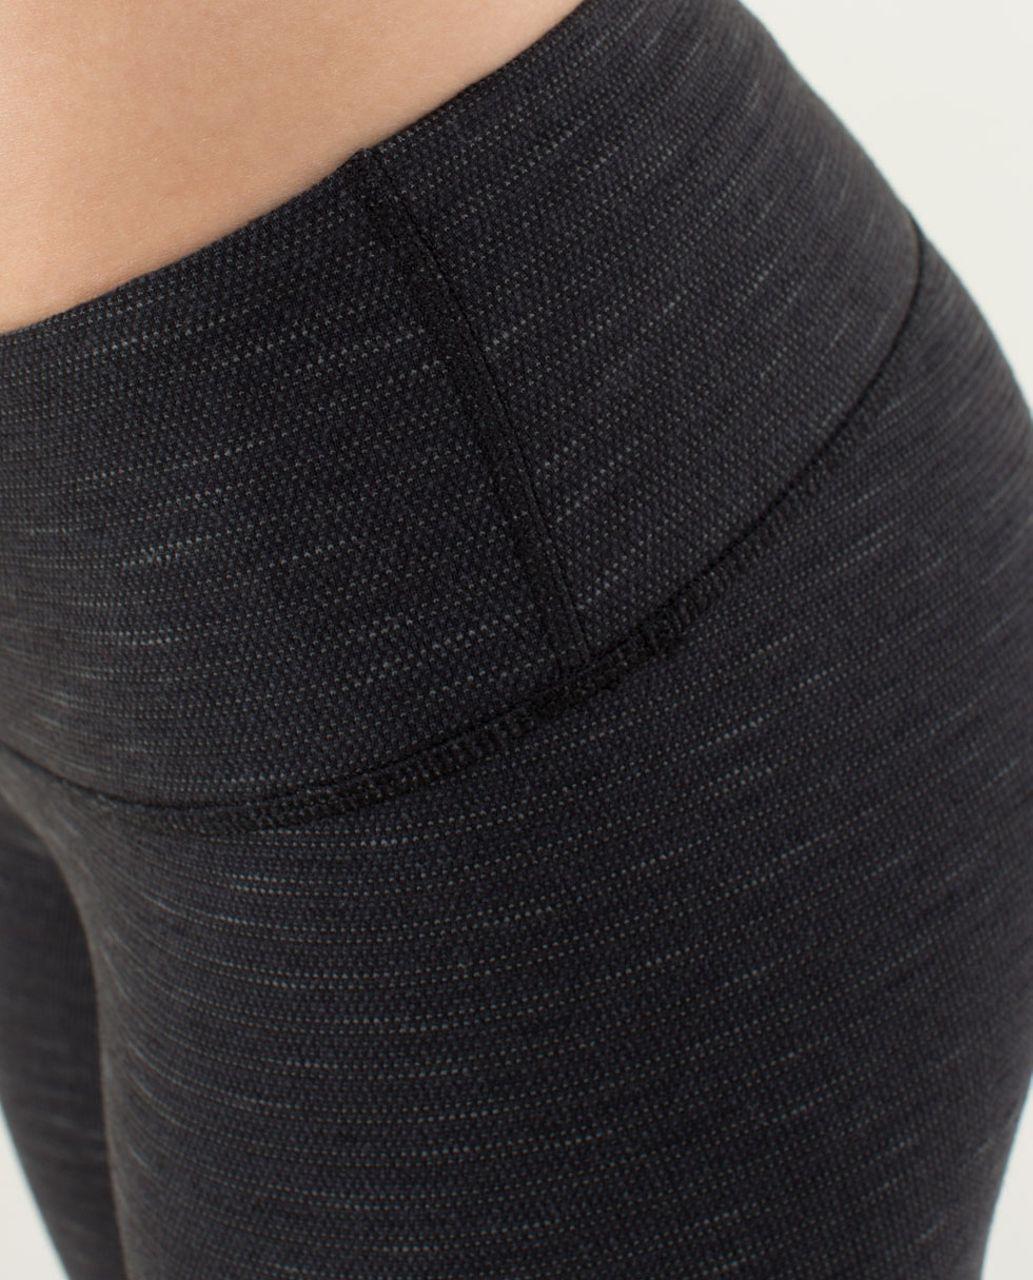 Lululemon Wunder Under Pant - Pique Luon Black / Black